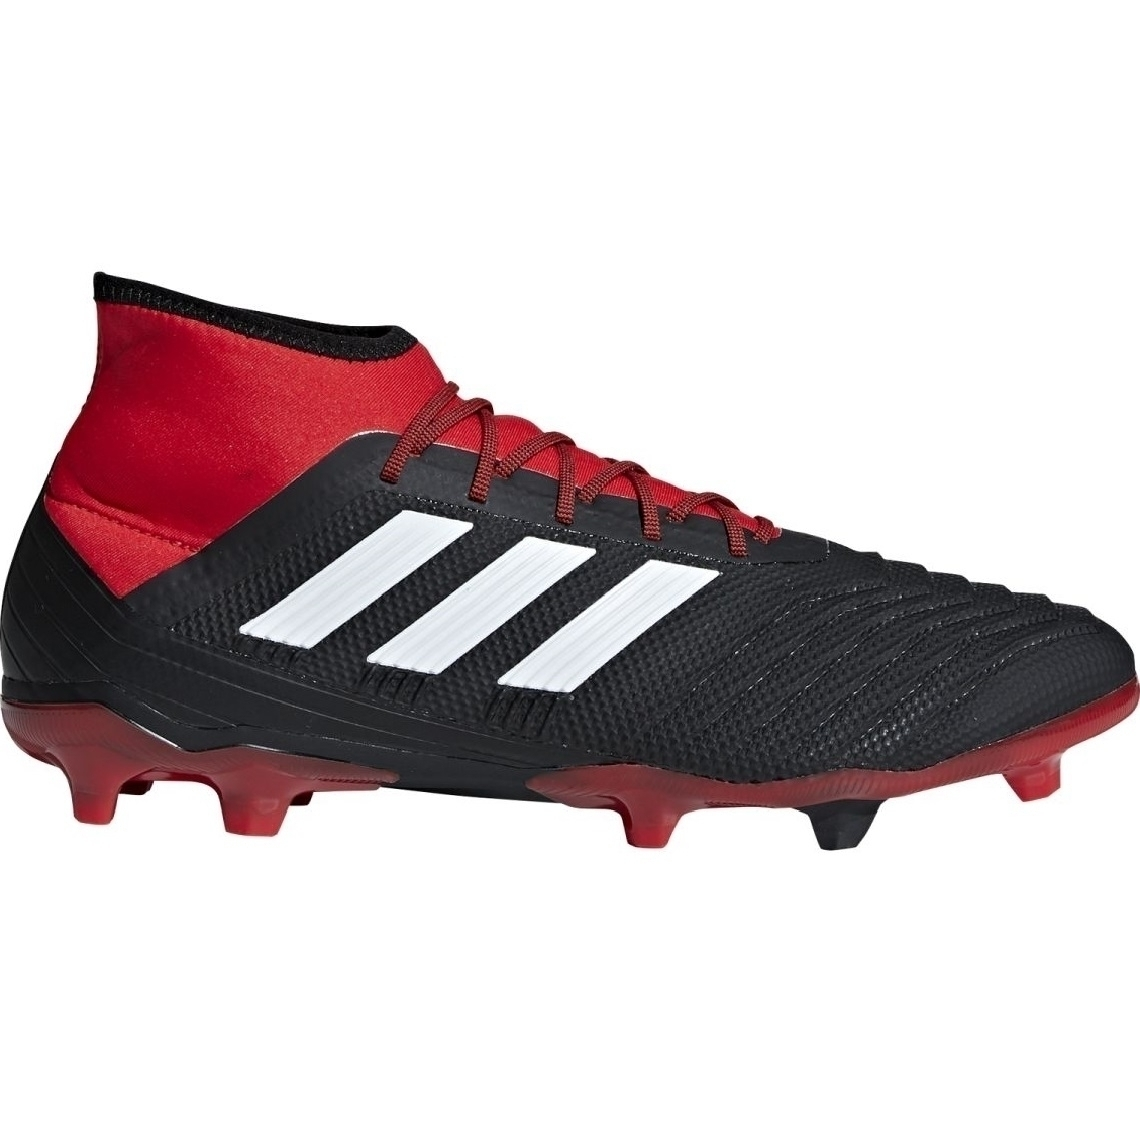 adidas Predator 18.2 FG Fußballschuhe